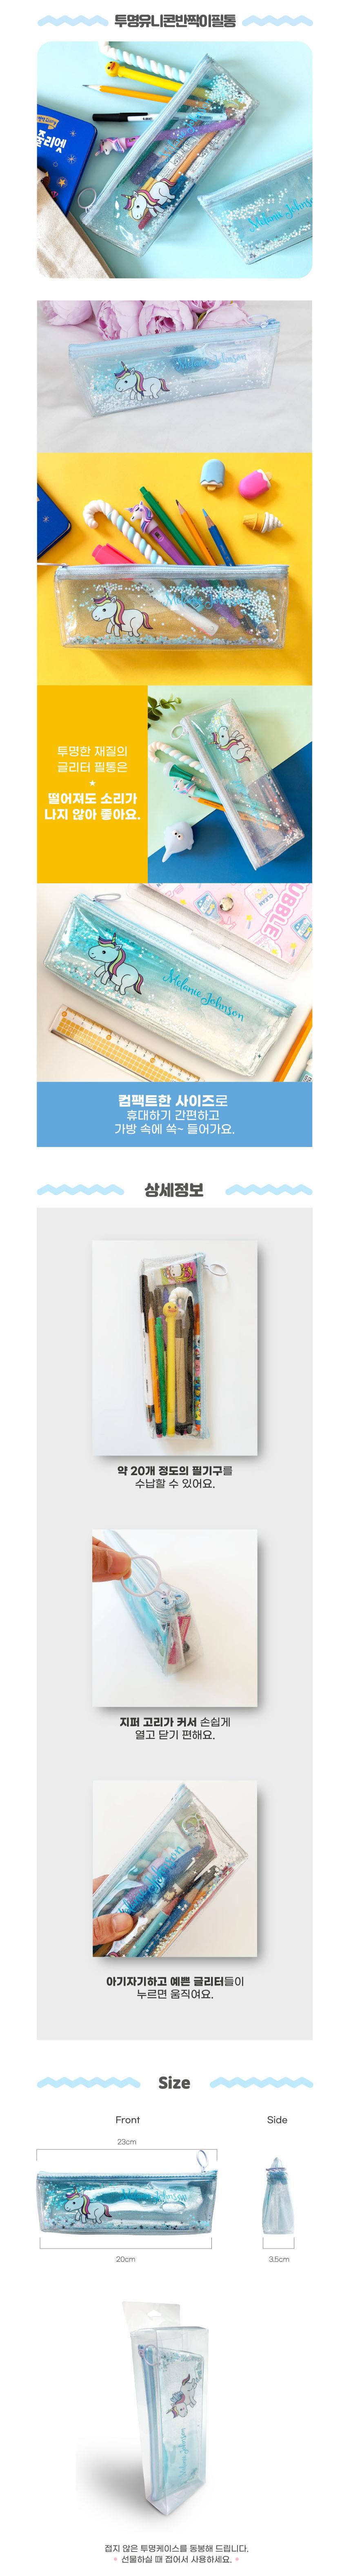 pencilcaseM_7.jpg